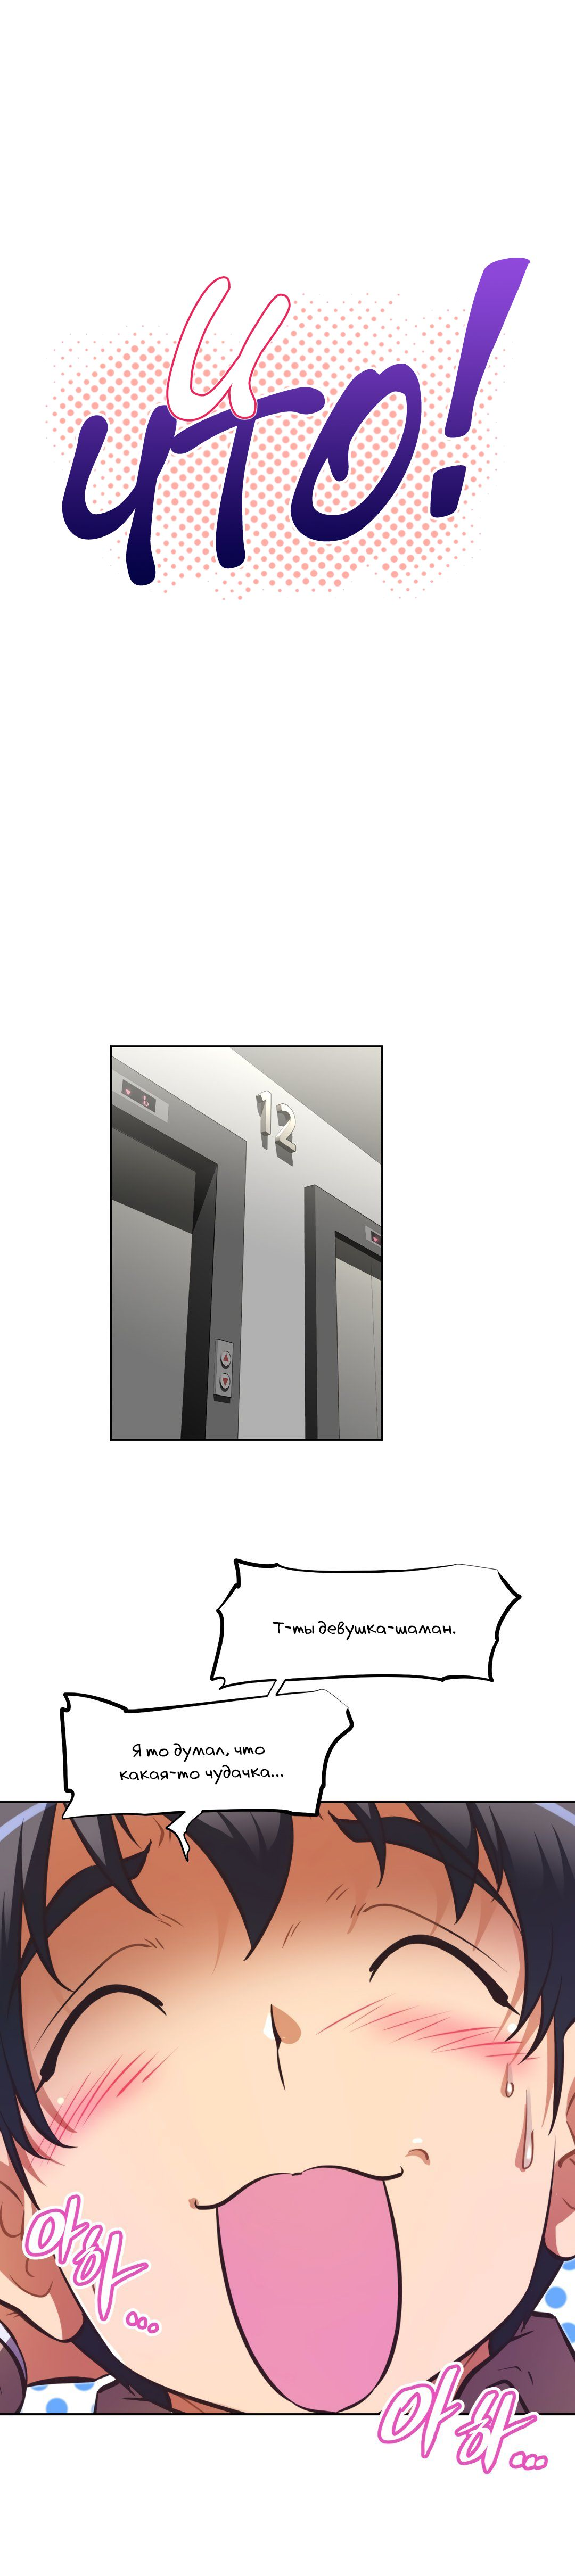 https://ru.mangadogs.com/comics/pic6/56/39224/1478398/1565709407359.jpg Page 3